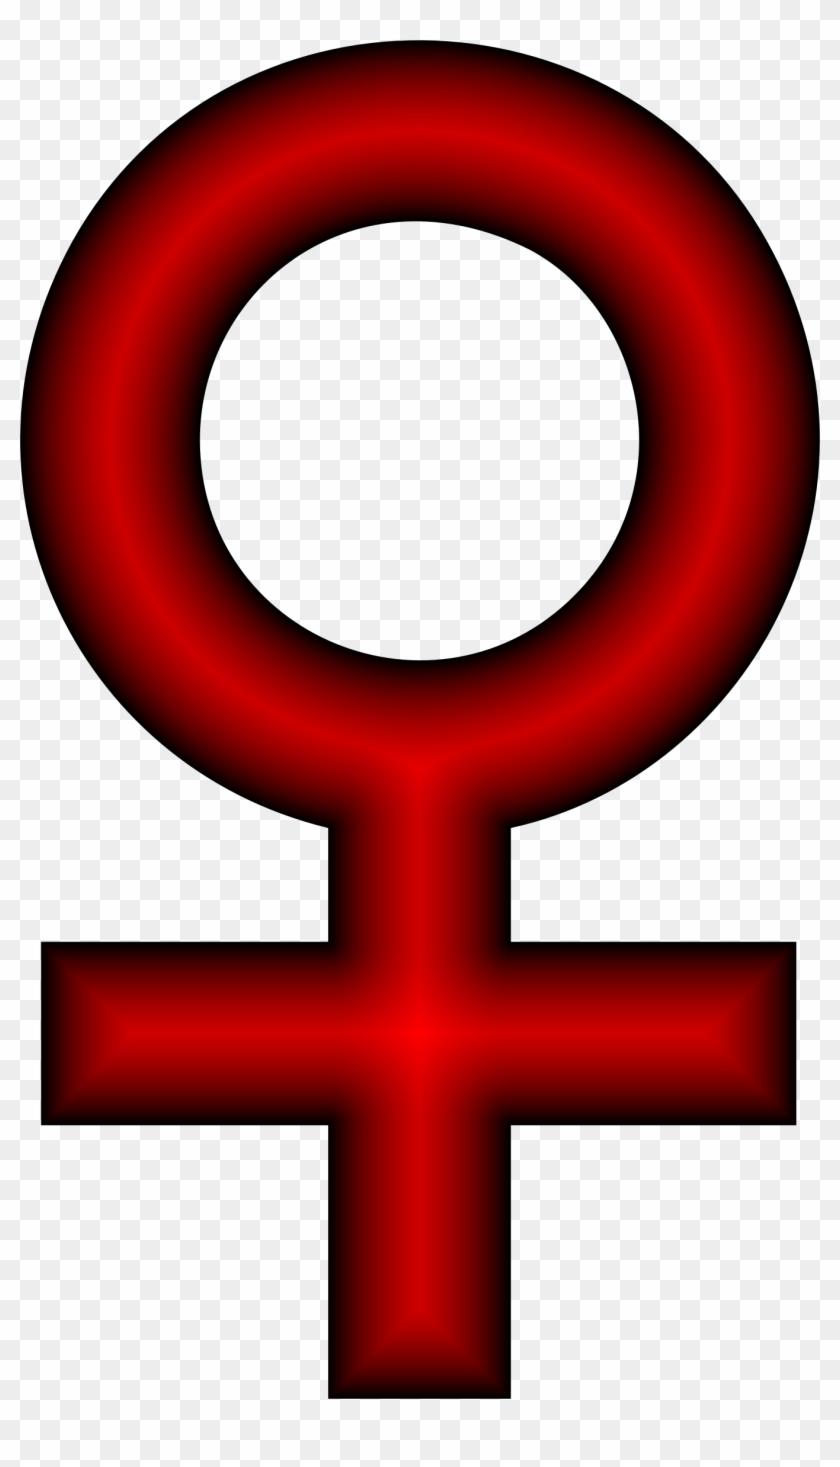 This Free Icons Png Design Of Female Symbol Crimson - Female Symbol Red Clipart #2792140